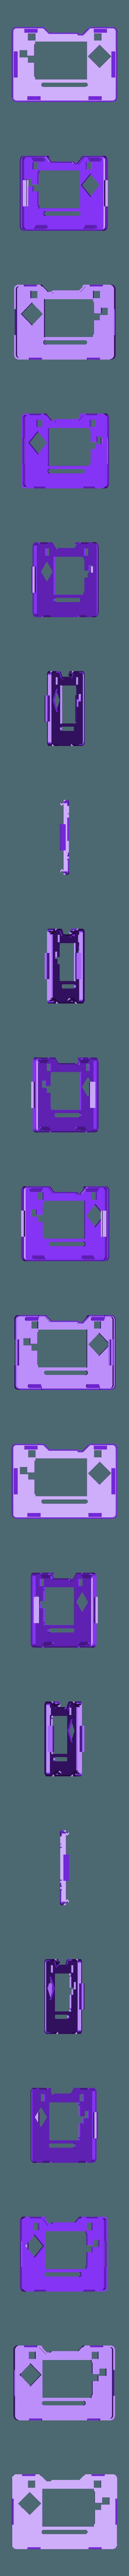 pymic-top.stl Download free STL file PyBadge Case with Flip Out Mic (TensorFlow Lite Kit) • Template to 3D print, Adafruit